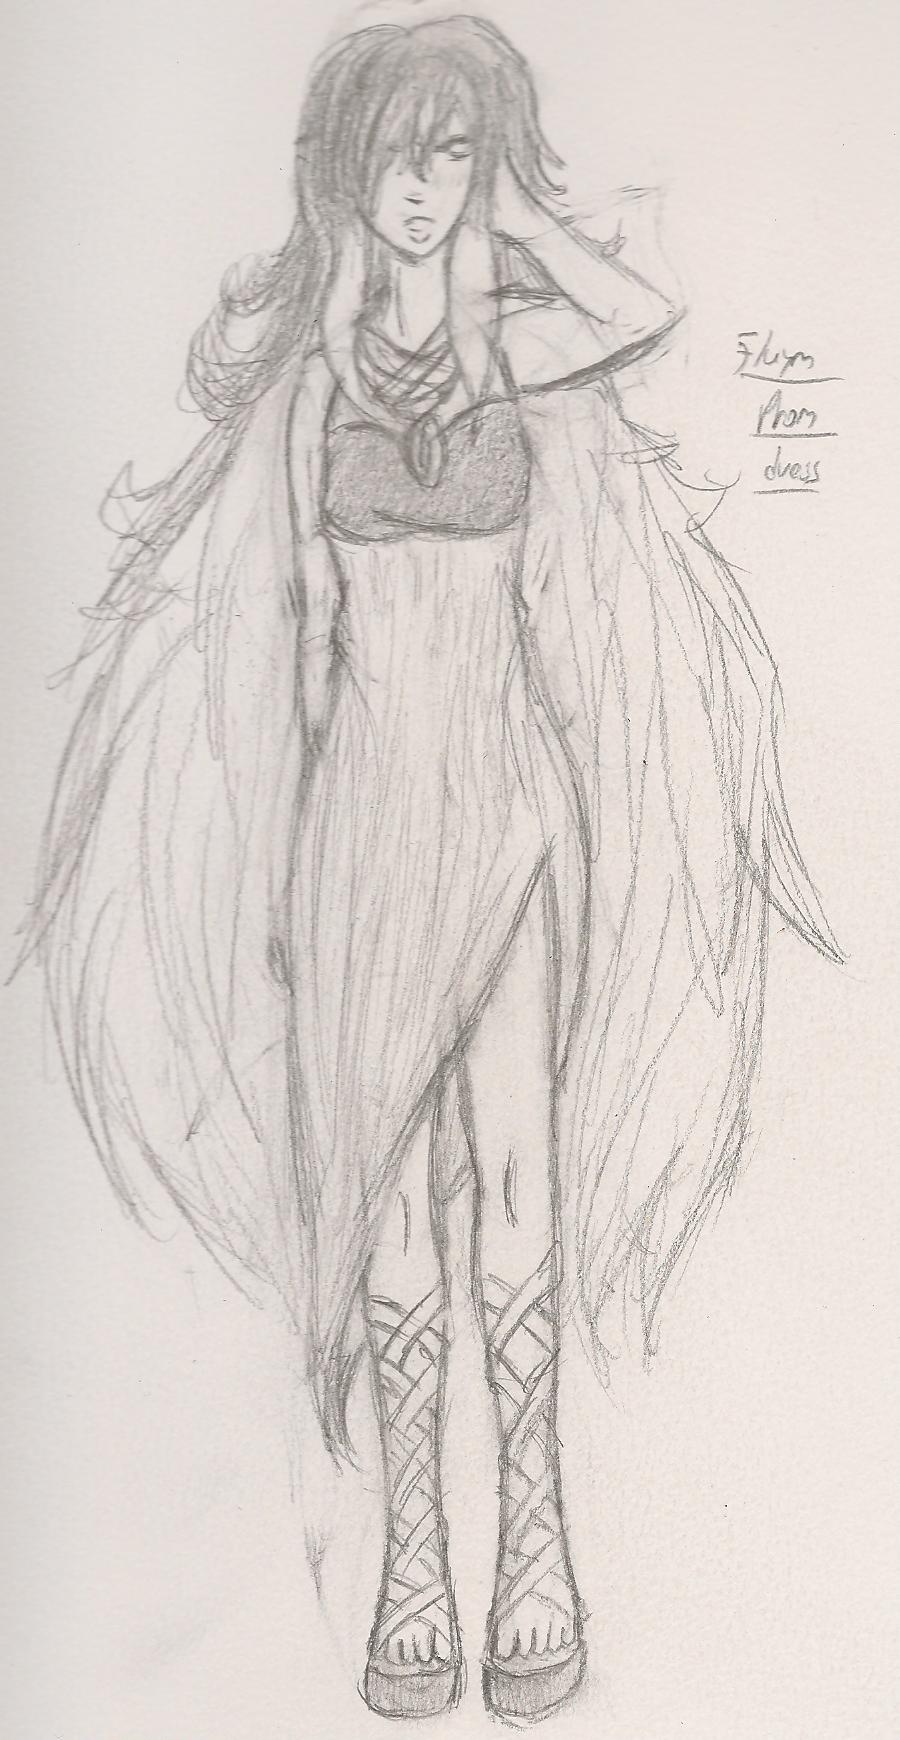 Flaym Prom Dress Sketch by Plot-is-EVIL on DeviantArt